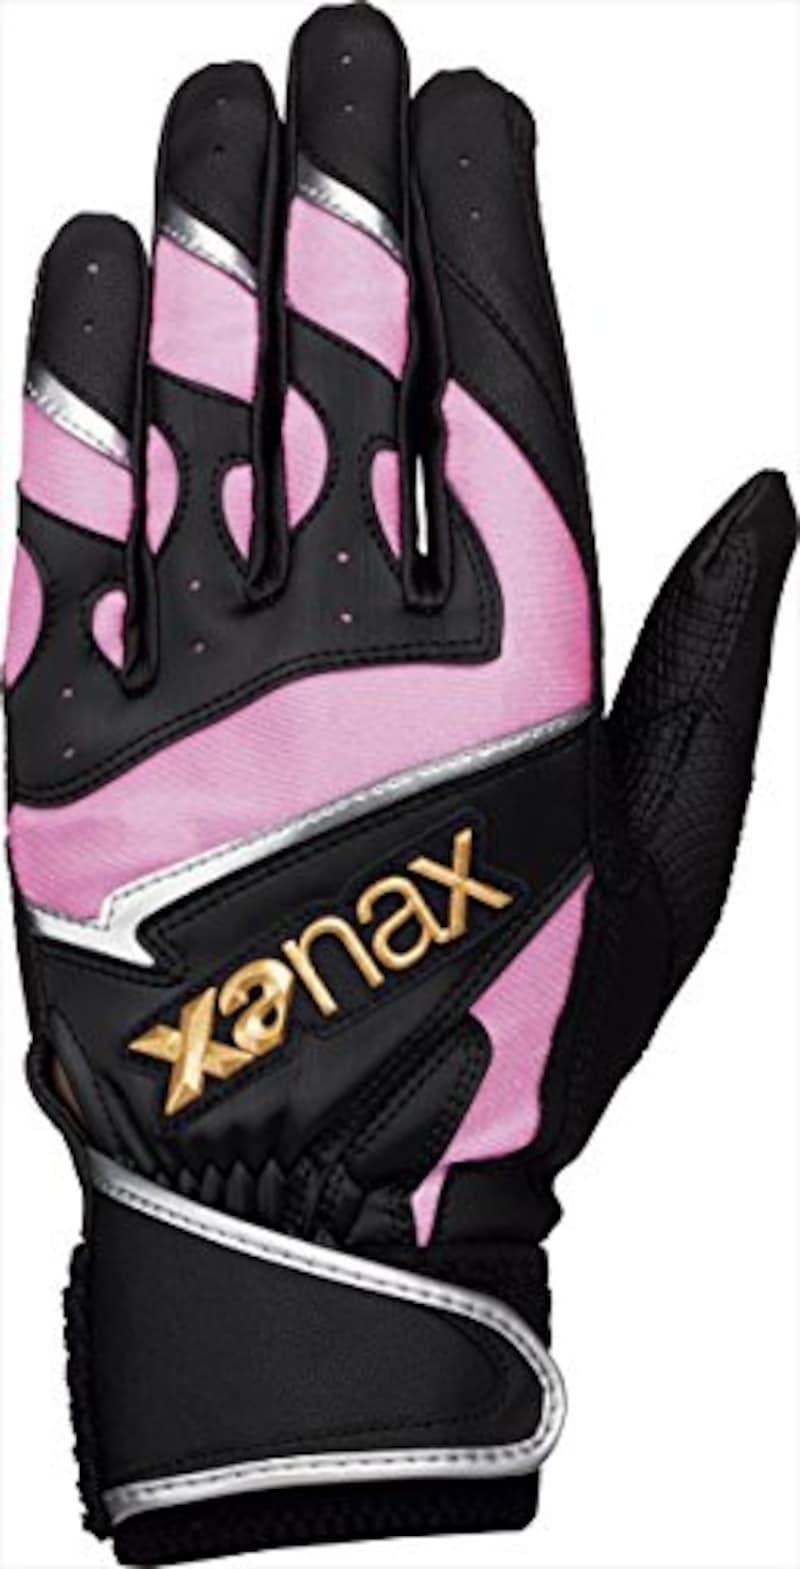 XANAX(ザナックス) バッティング手袋